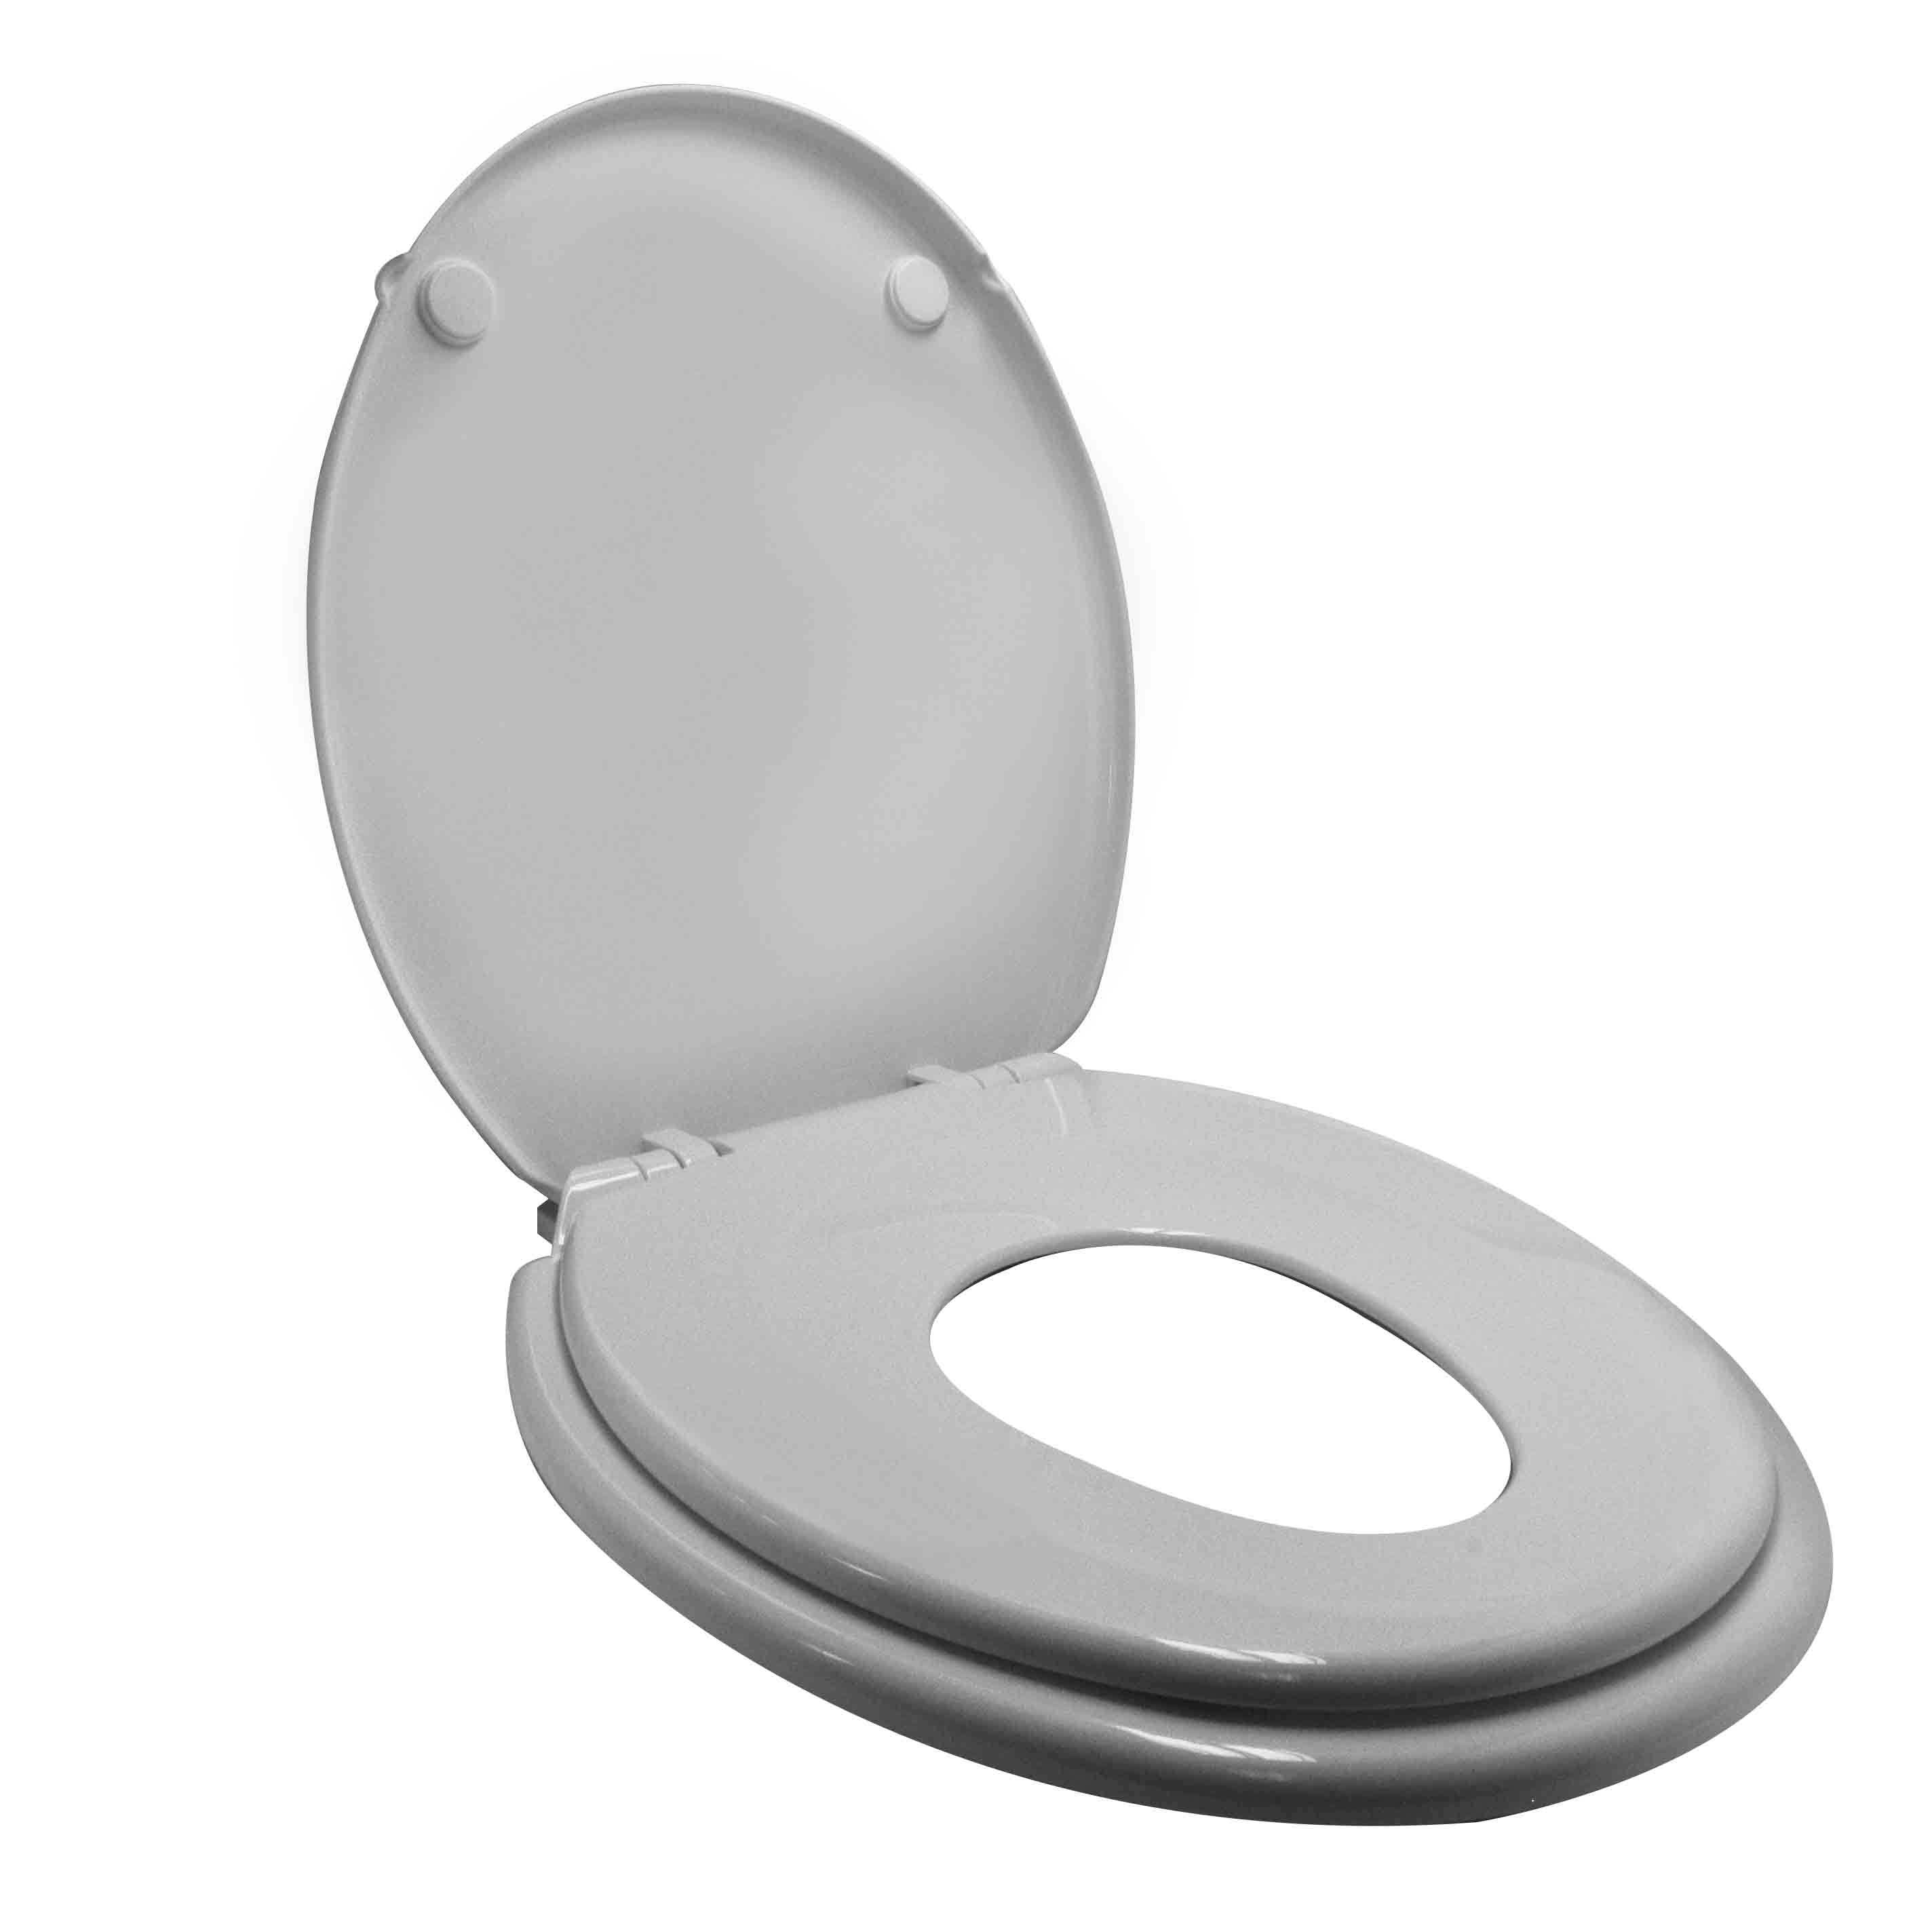 Wiesbaden Family 2.0 dubbele toiletzitting met soft-close